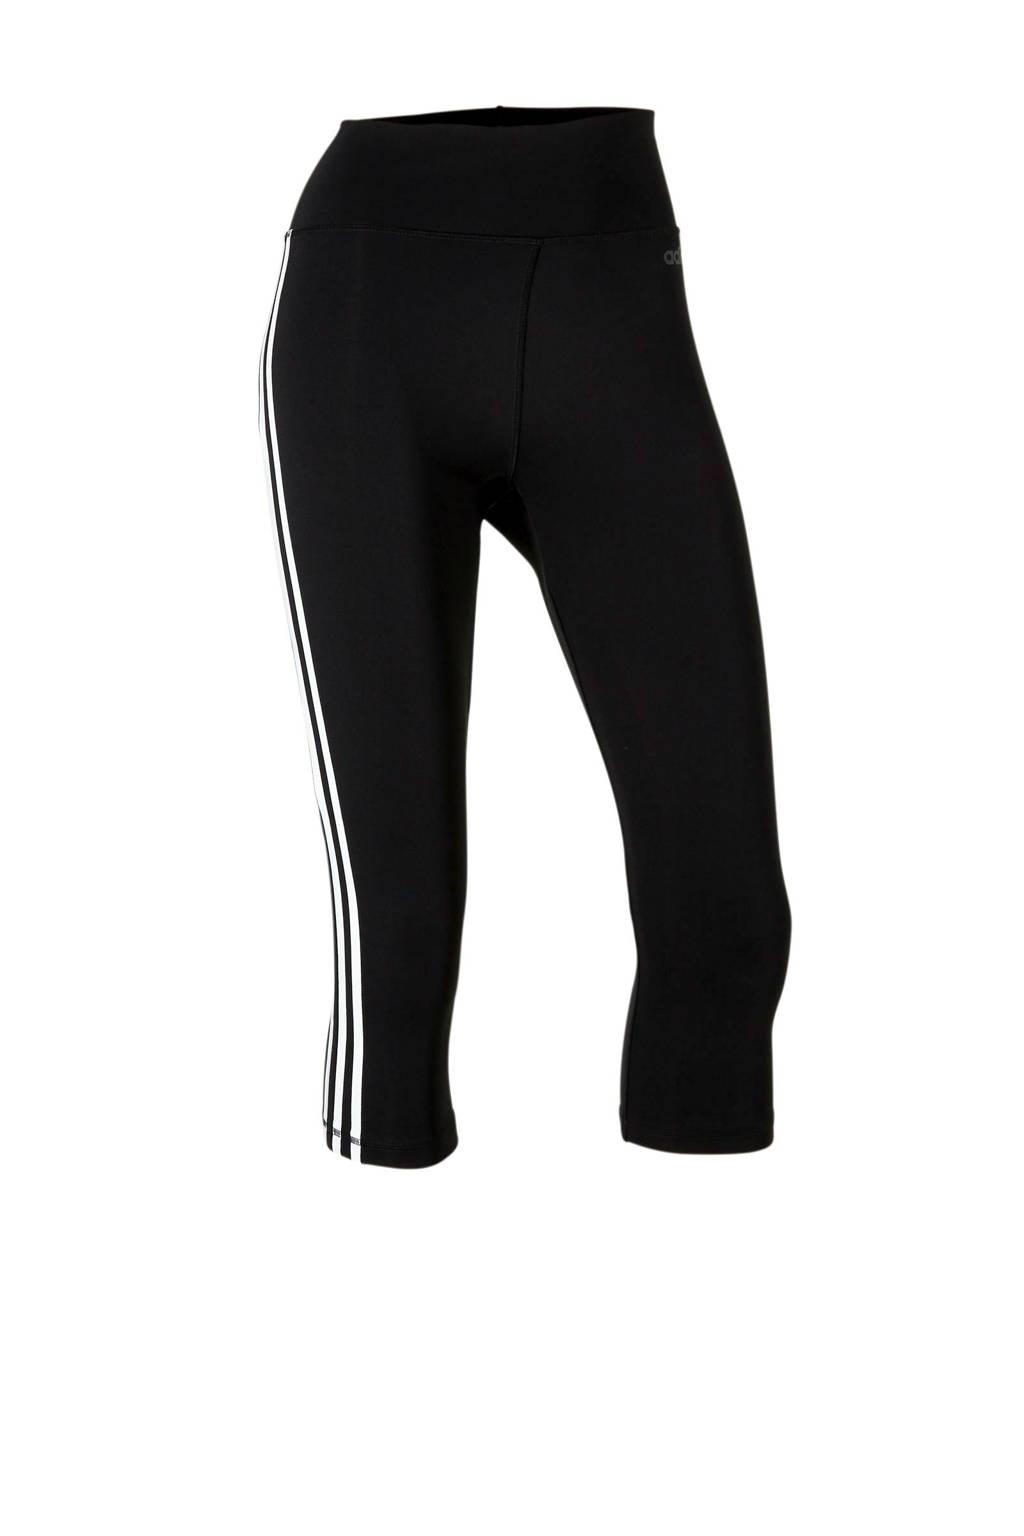 adidas Performance sportcapri zwart, Zwart/wit